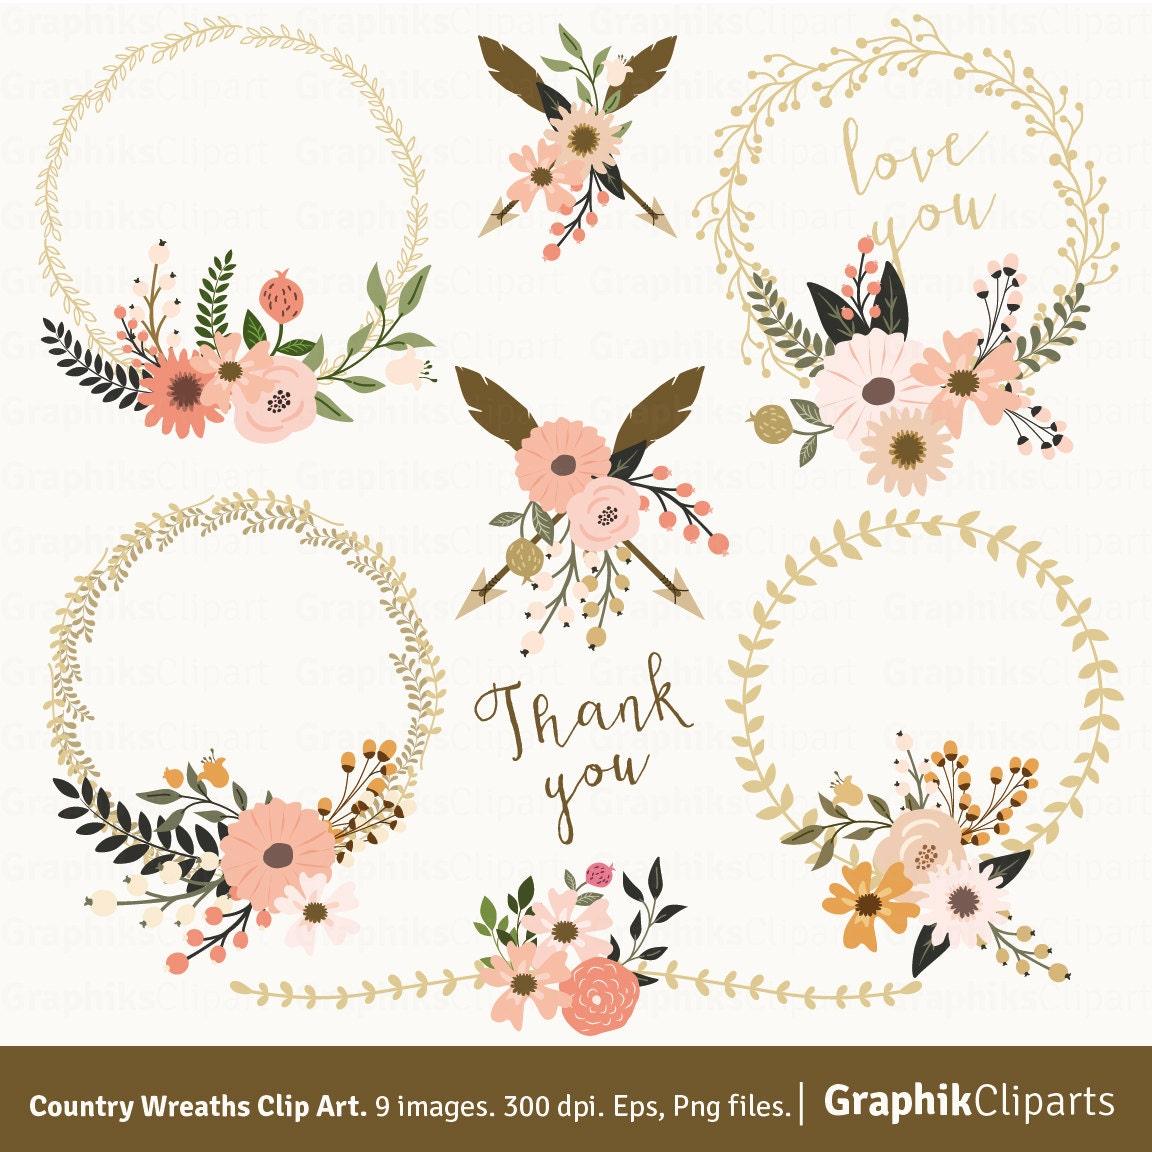 Country Wreaths Clip Art. WREATHS CLIP ART. Rustic Wedding